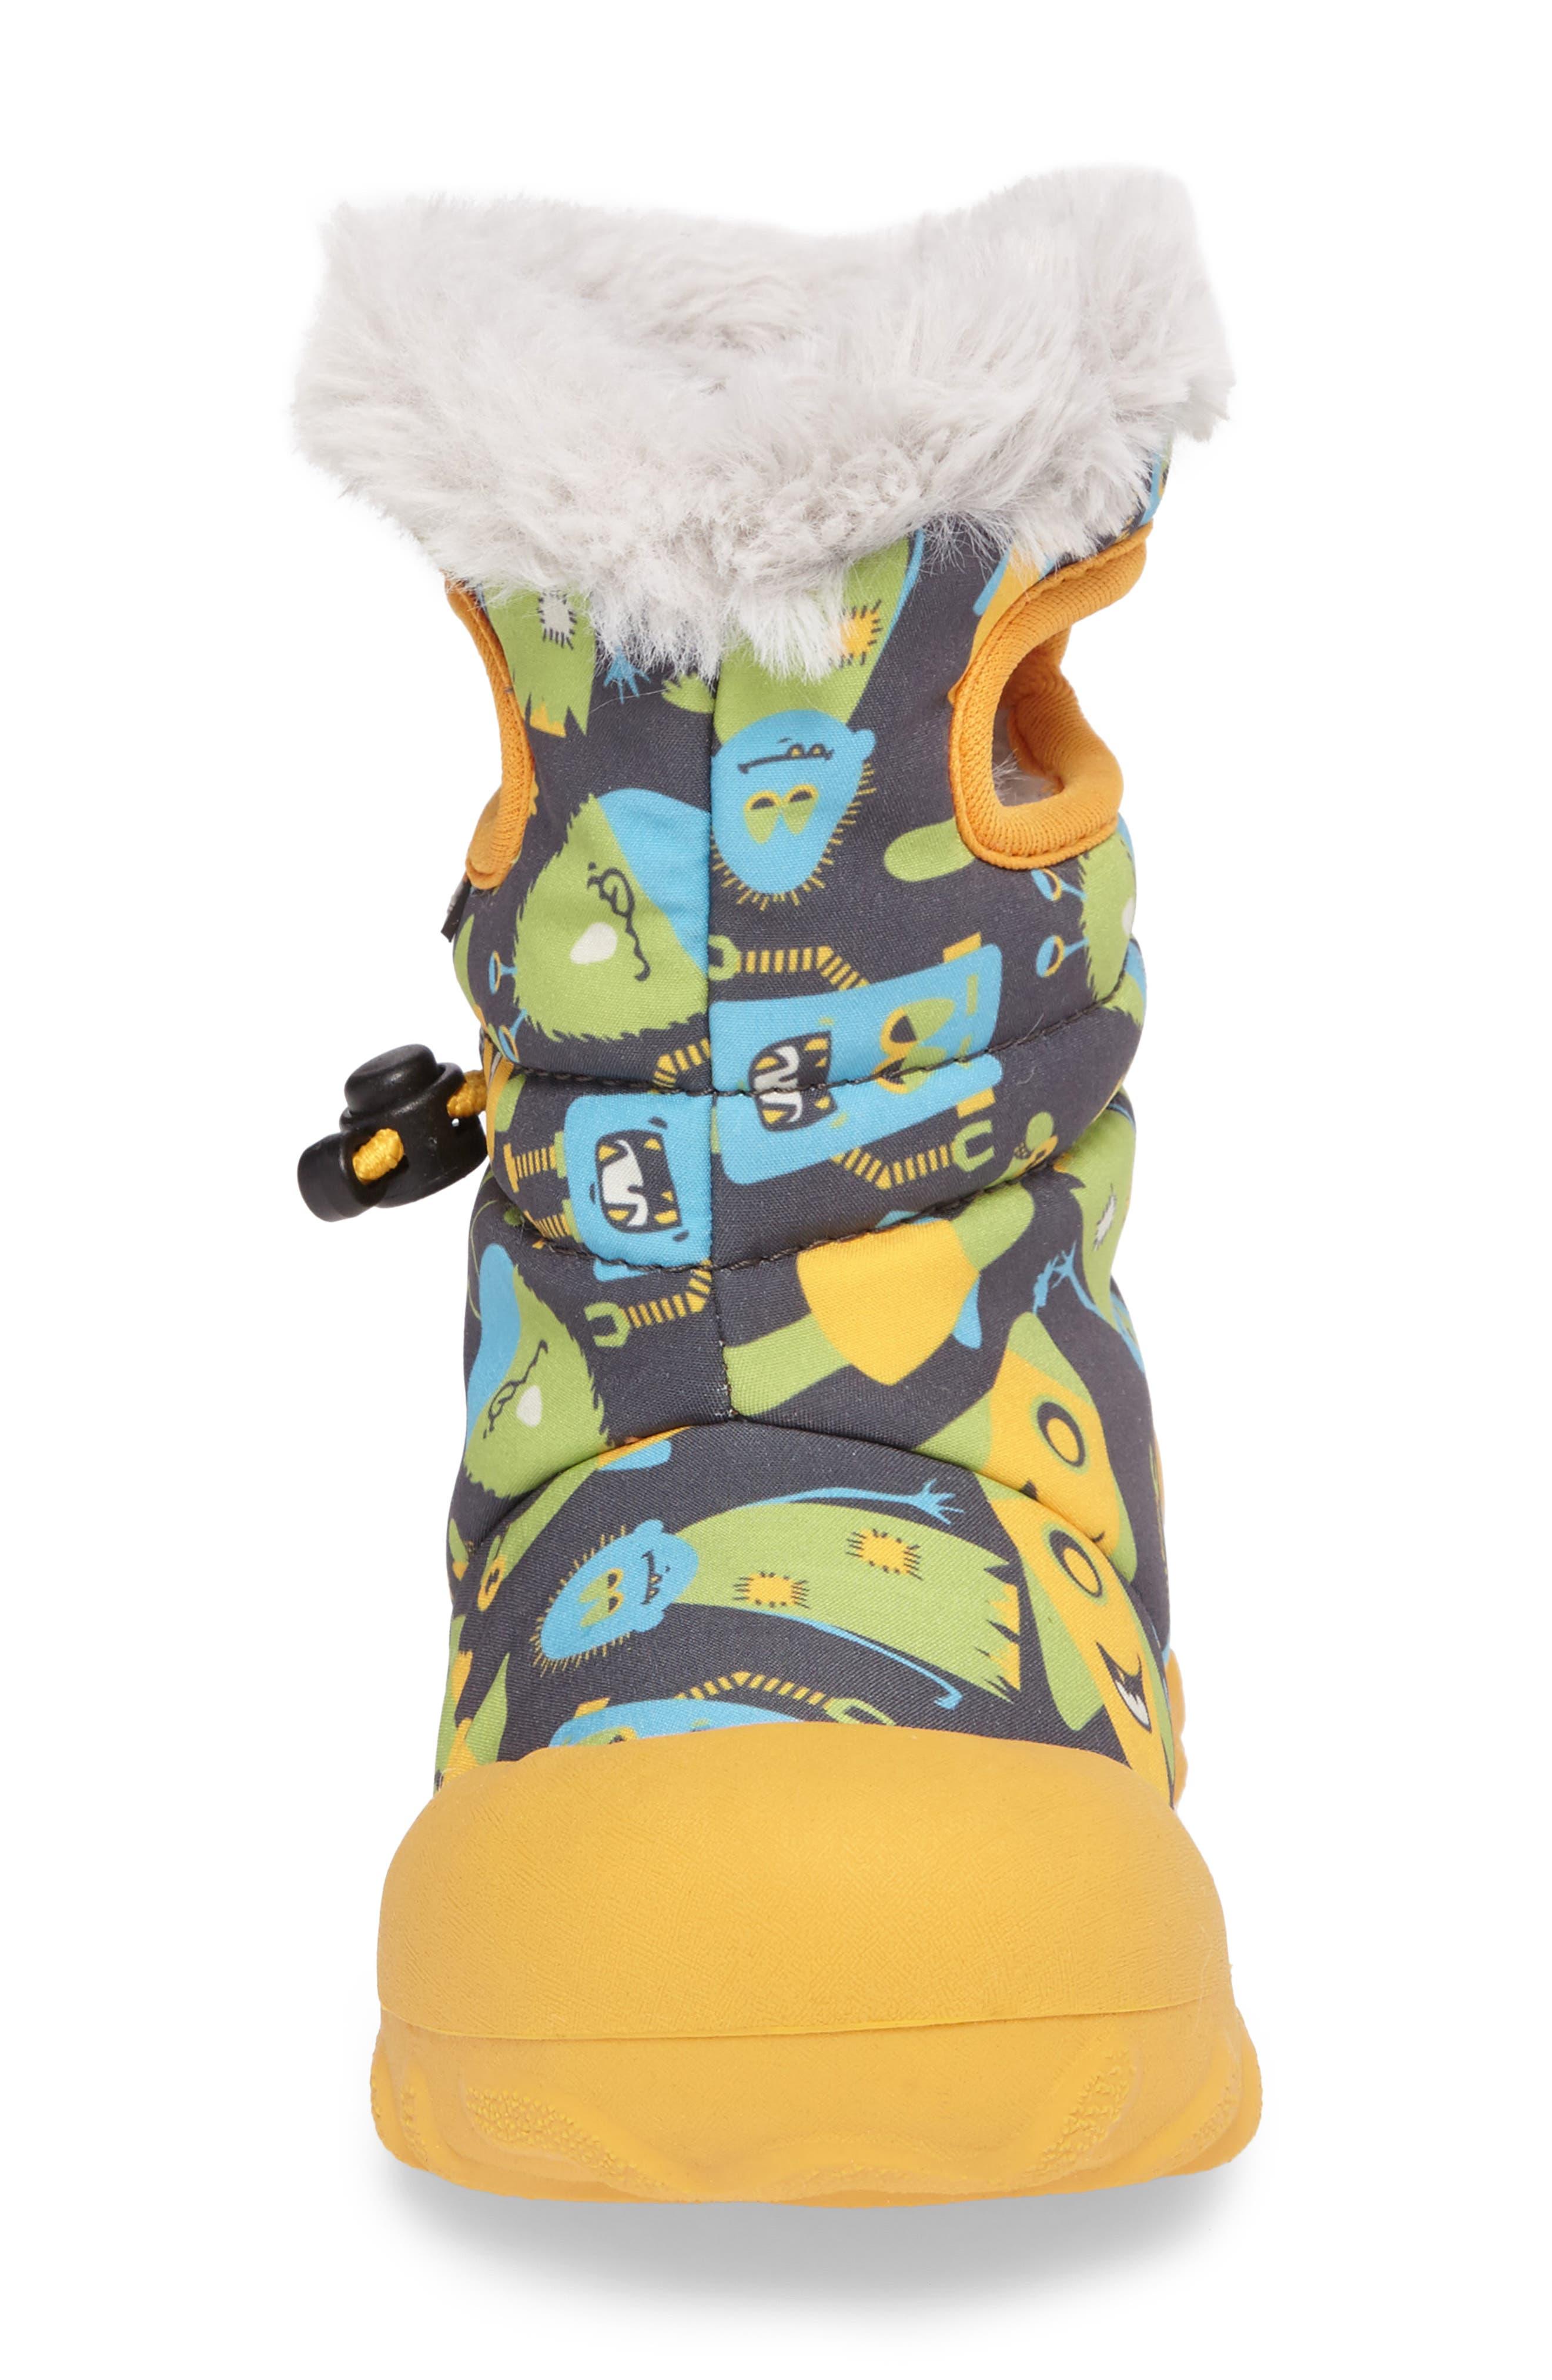 Alternate Image 4  - Bogs B-MOC Monsters Waterproof Insulated Faux Fur Winter Boot (Walker, Toddler, Little Kid & Big Kid)